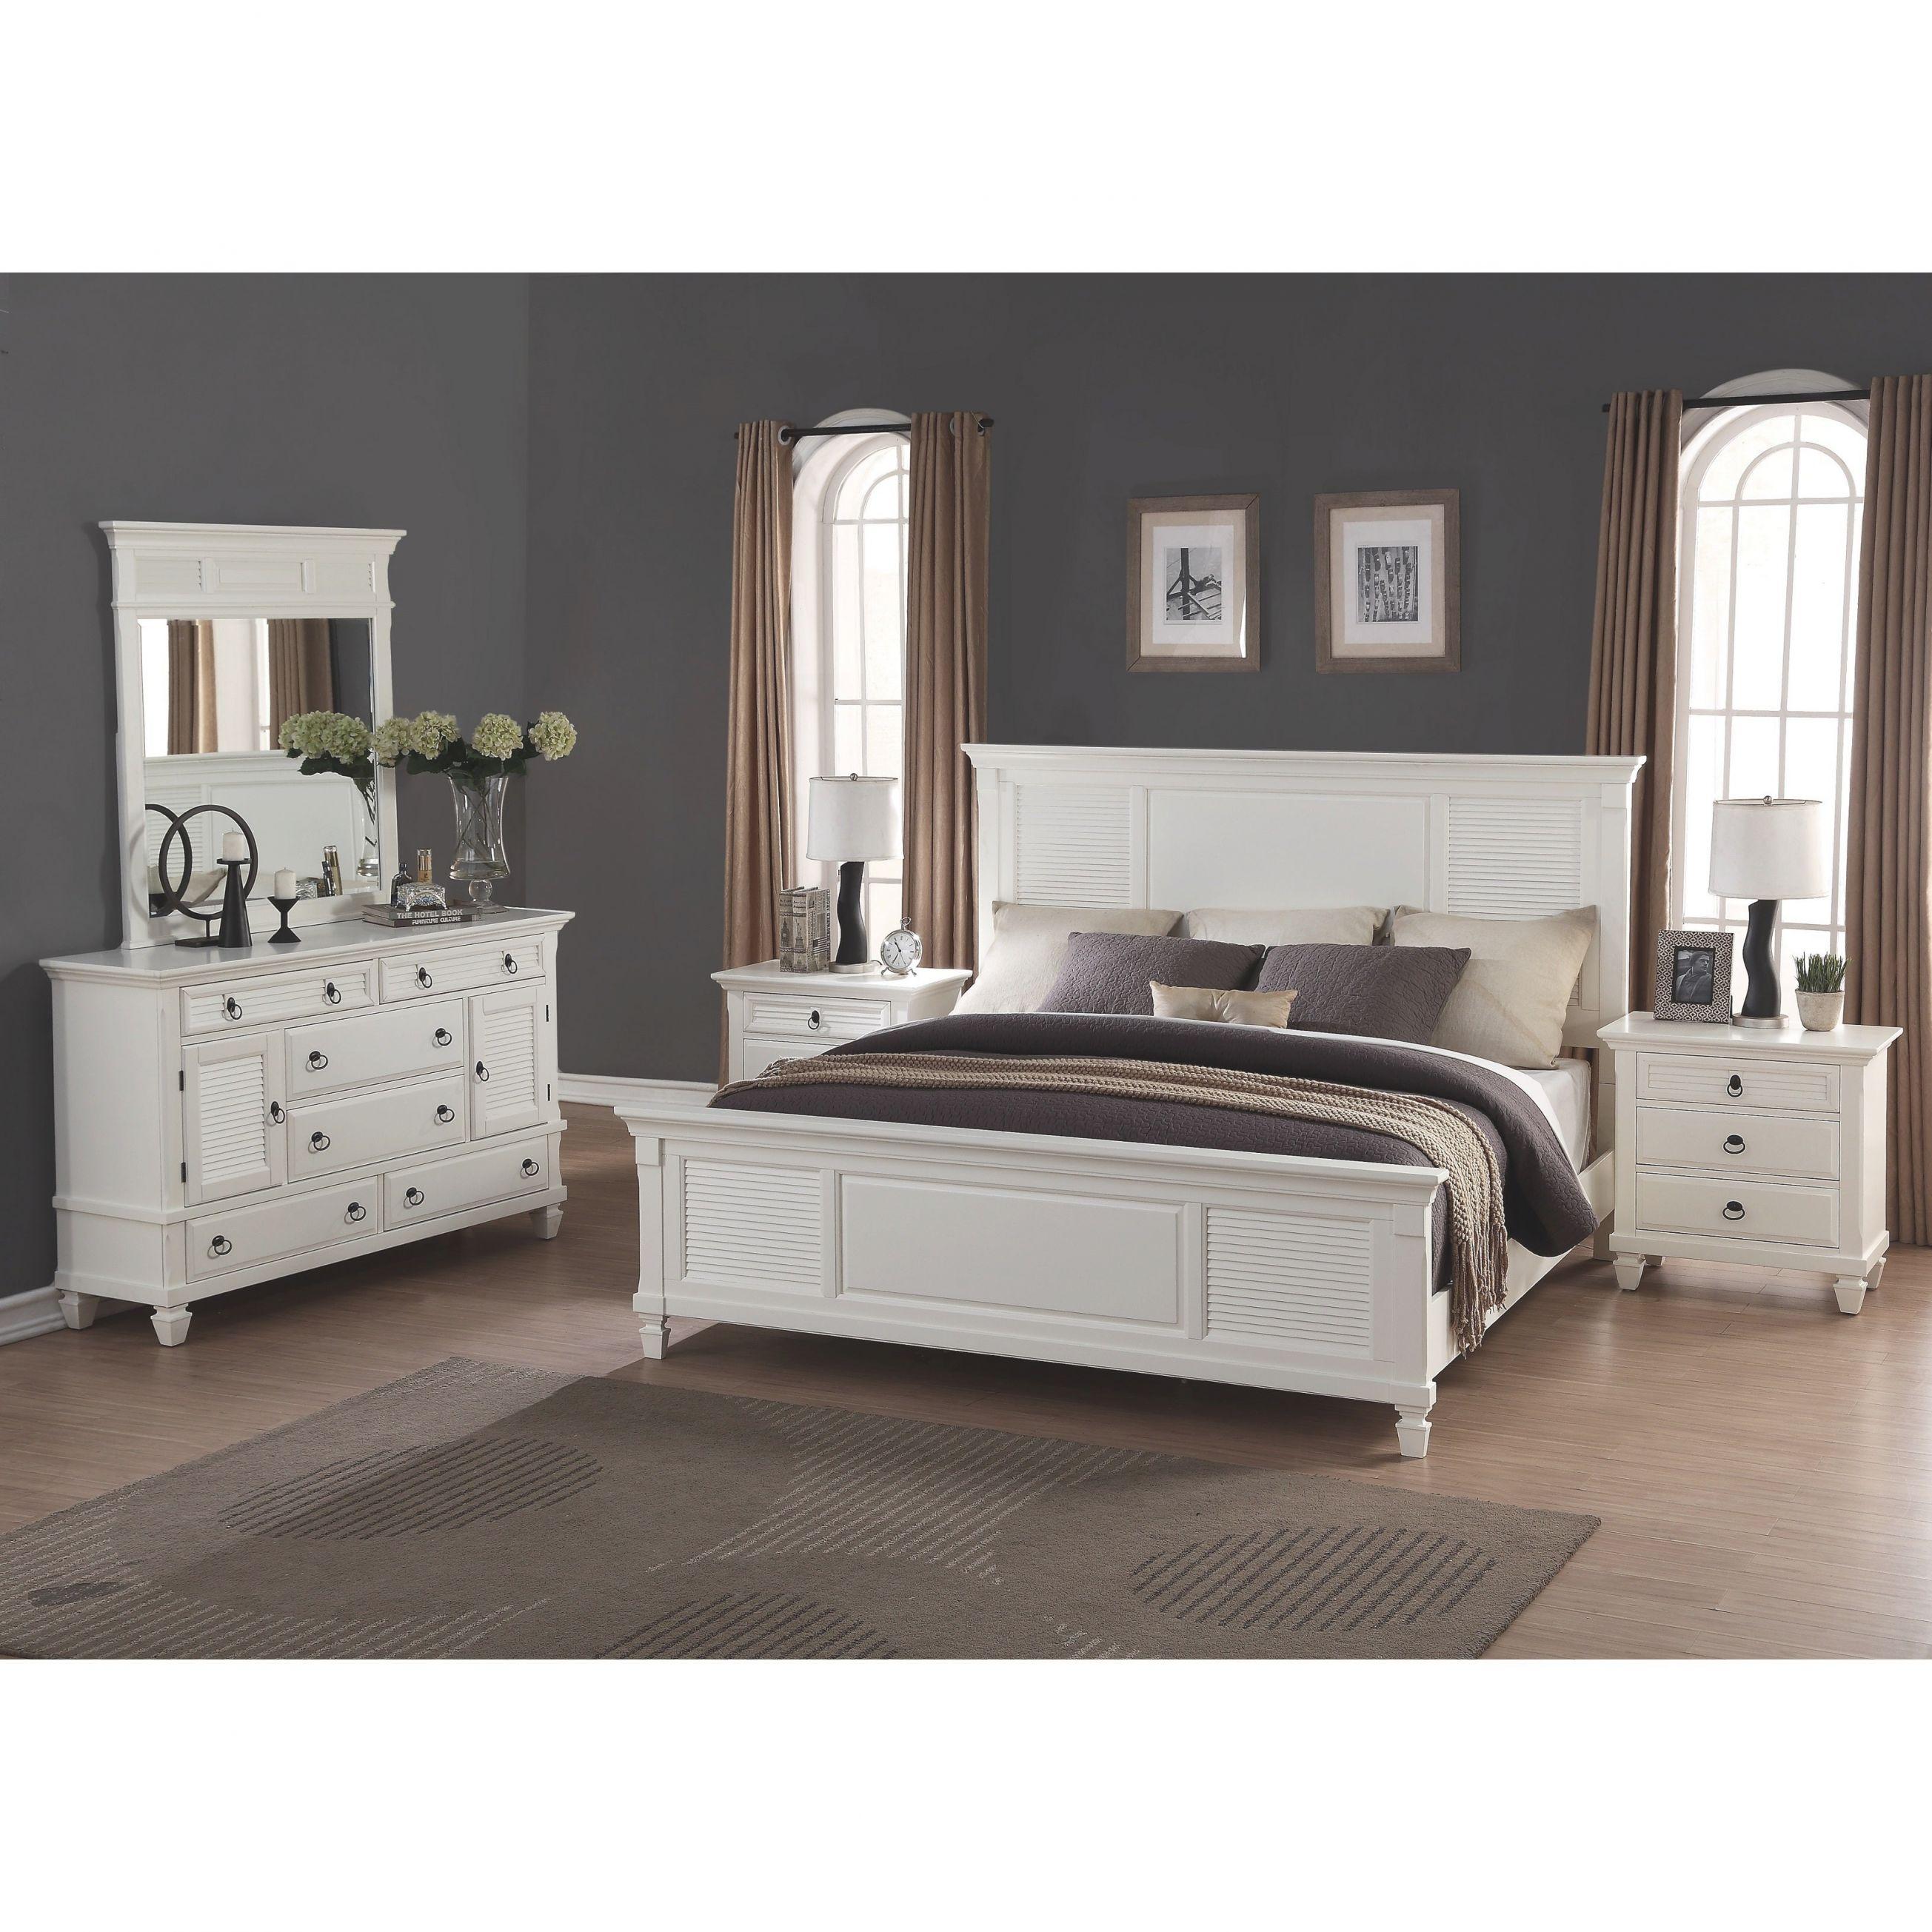 Regitina White 5-Piece King-Size Bedroom Furniture Set with Cheap White Bedroom Furniture Sets